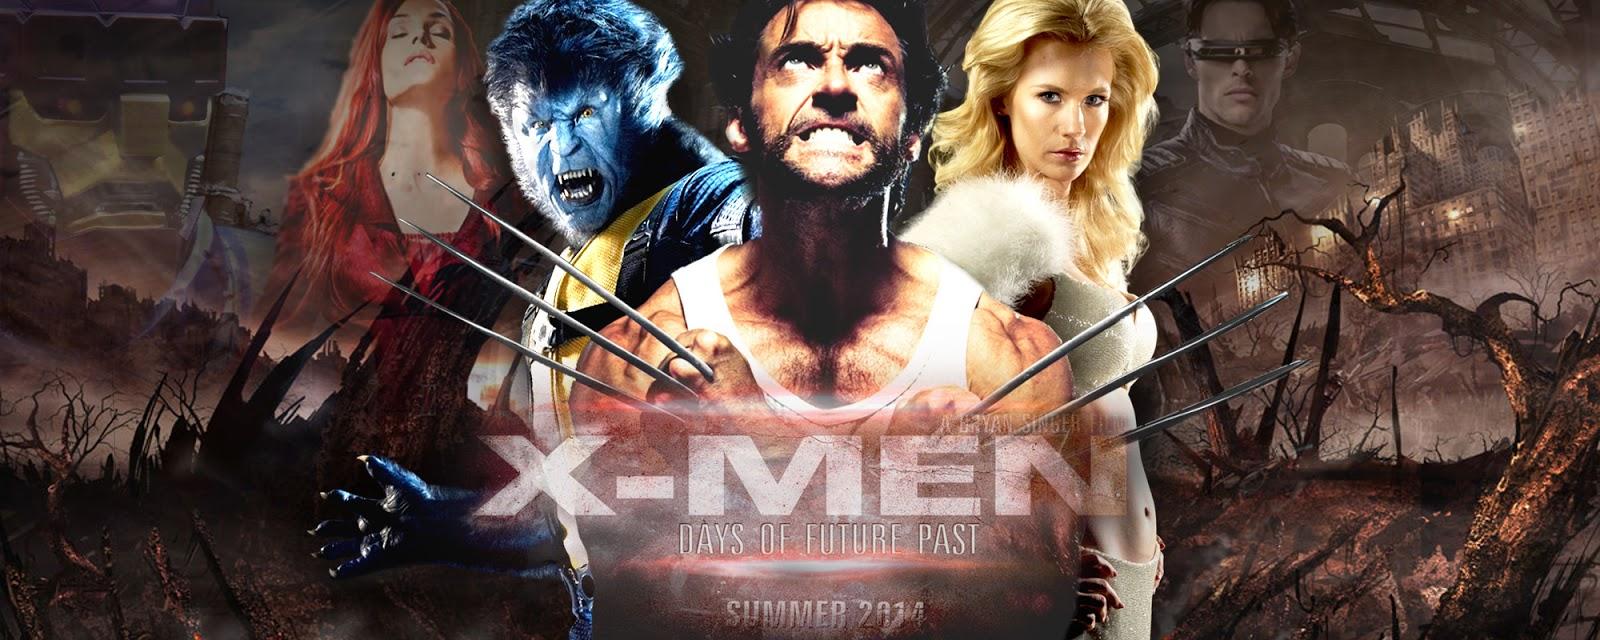 X Men Days Of Future Past New Trailer New Mutants New War Movies